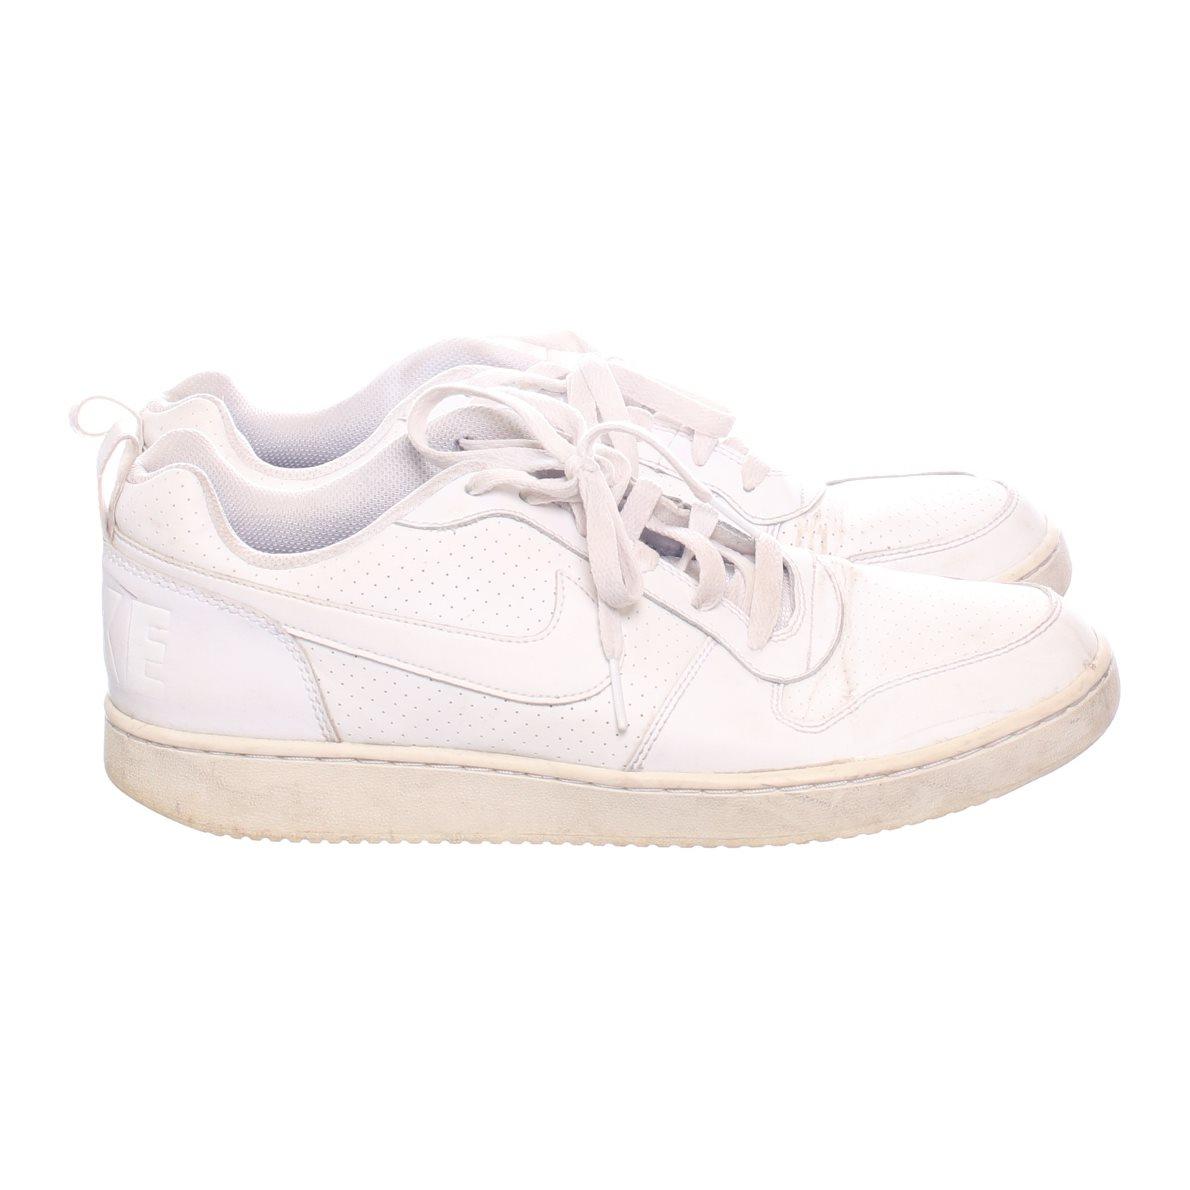 wholesale dealer 68102 99a55 Nike, Sneakers, Strl  44.5, Vit